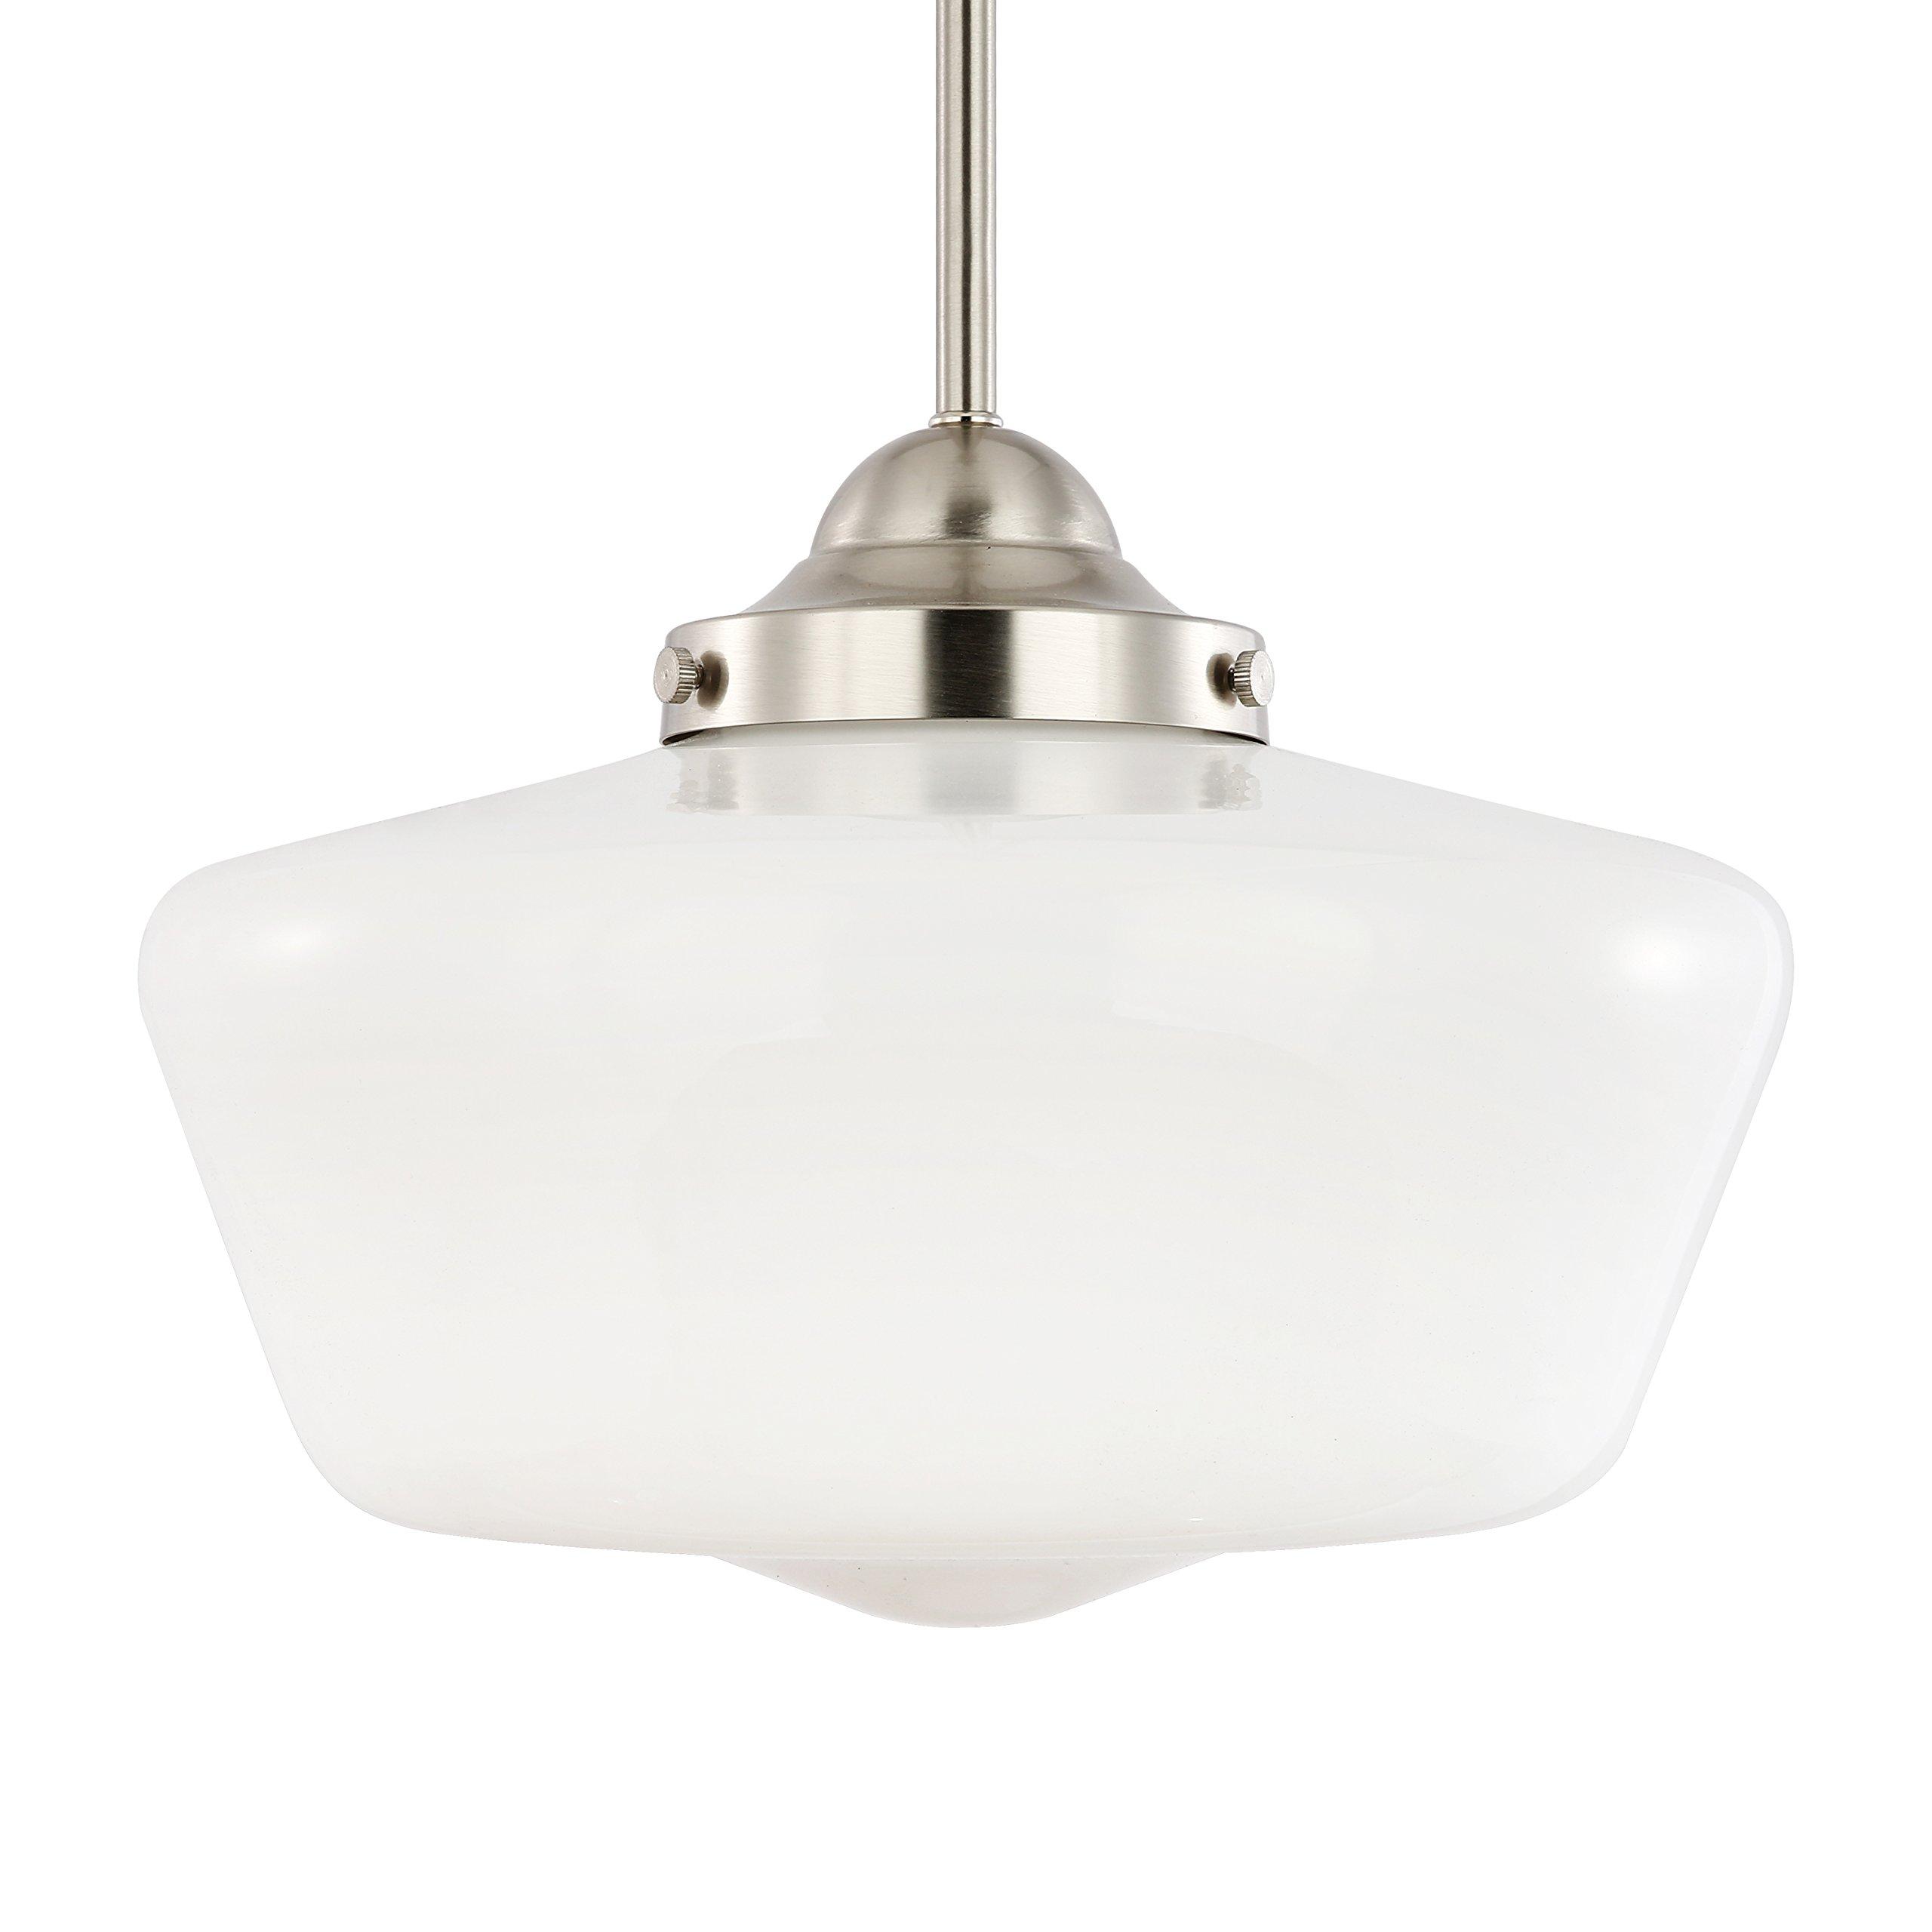 Light Society Portola Schoolhouse Pendant Light, Satin Nickel with White Opal Glass Shade, Classic Vintage Modern Lighting Fixture (LS-C251-SN-WH)